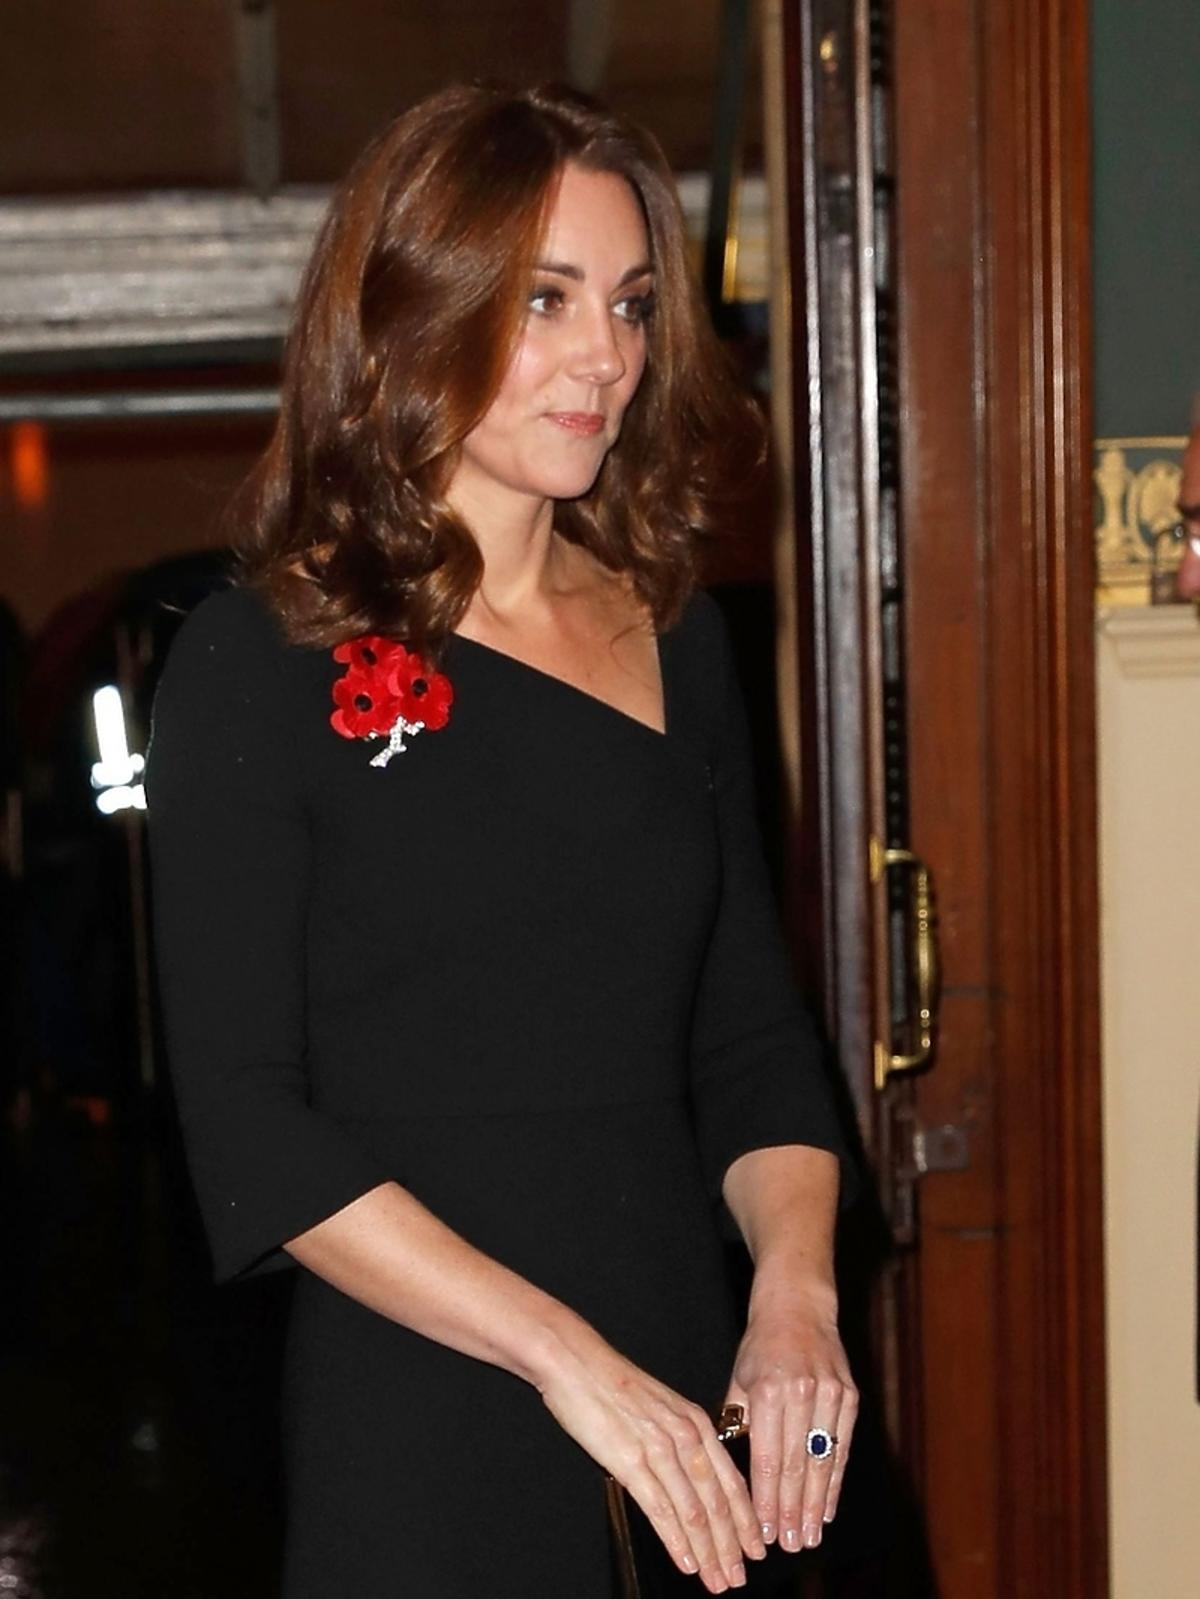 Księżna Kate na obchodach Dnia Pamięci